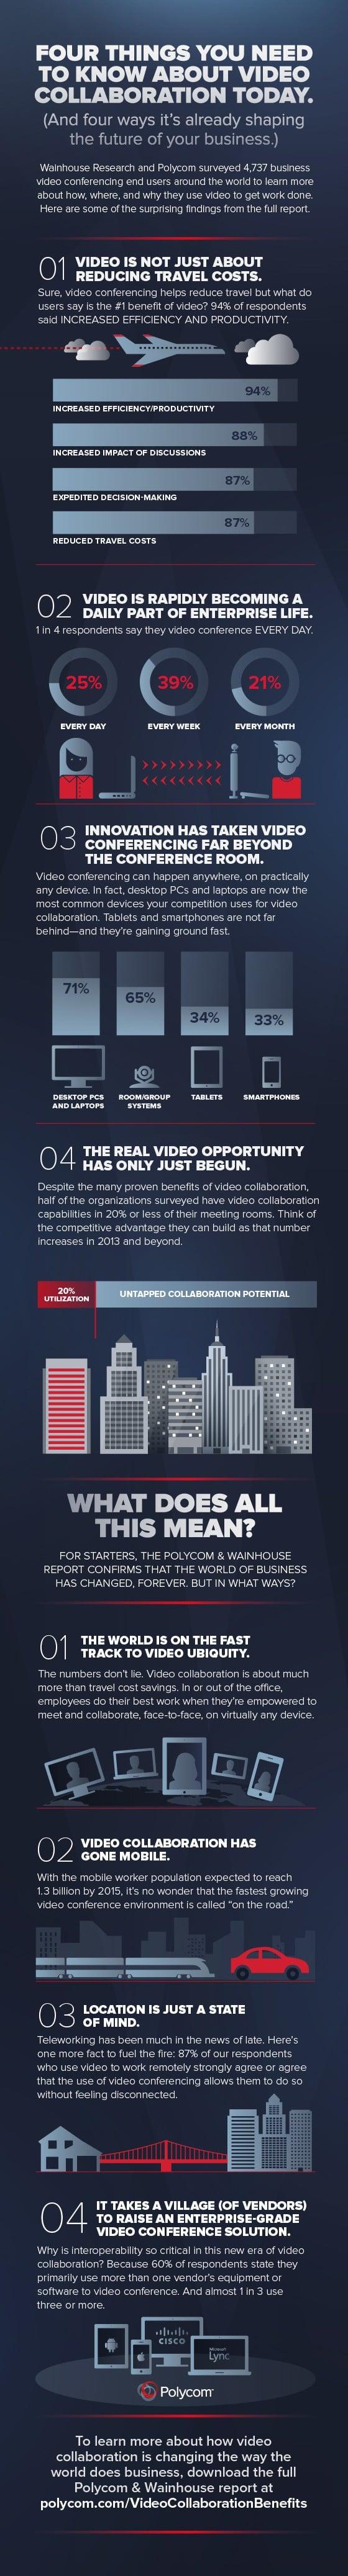 infographic-video